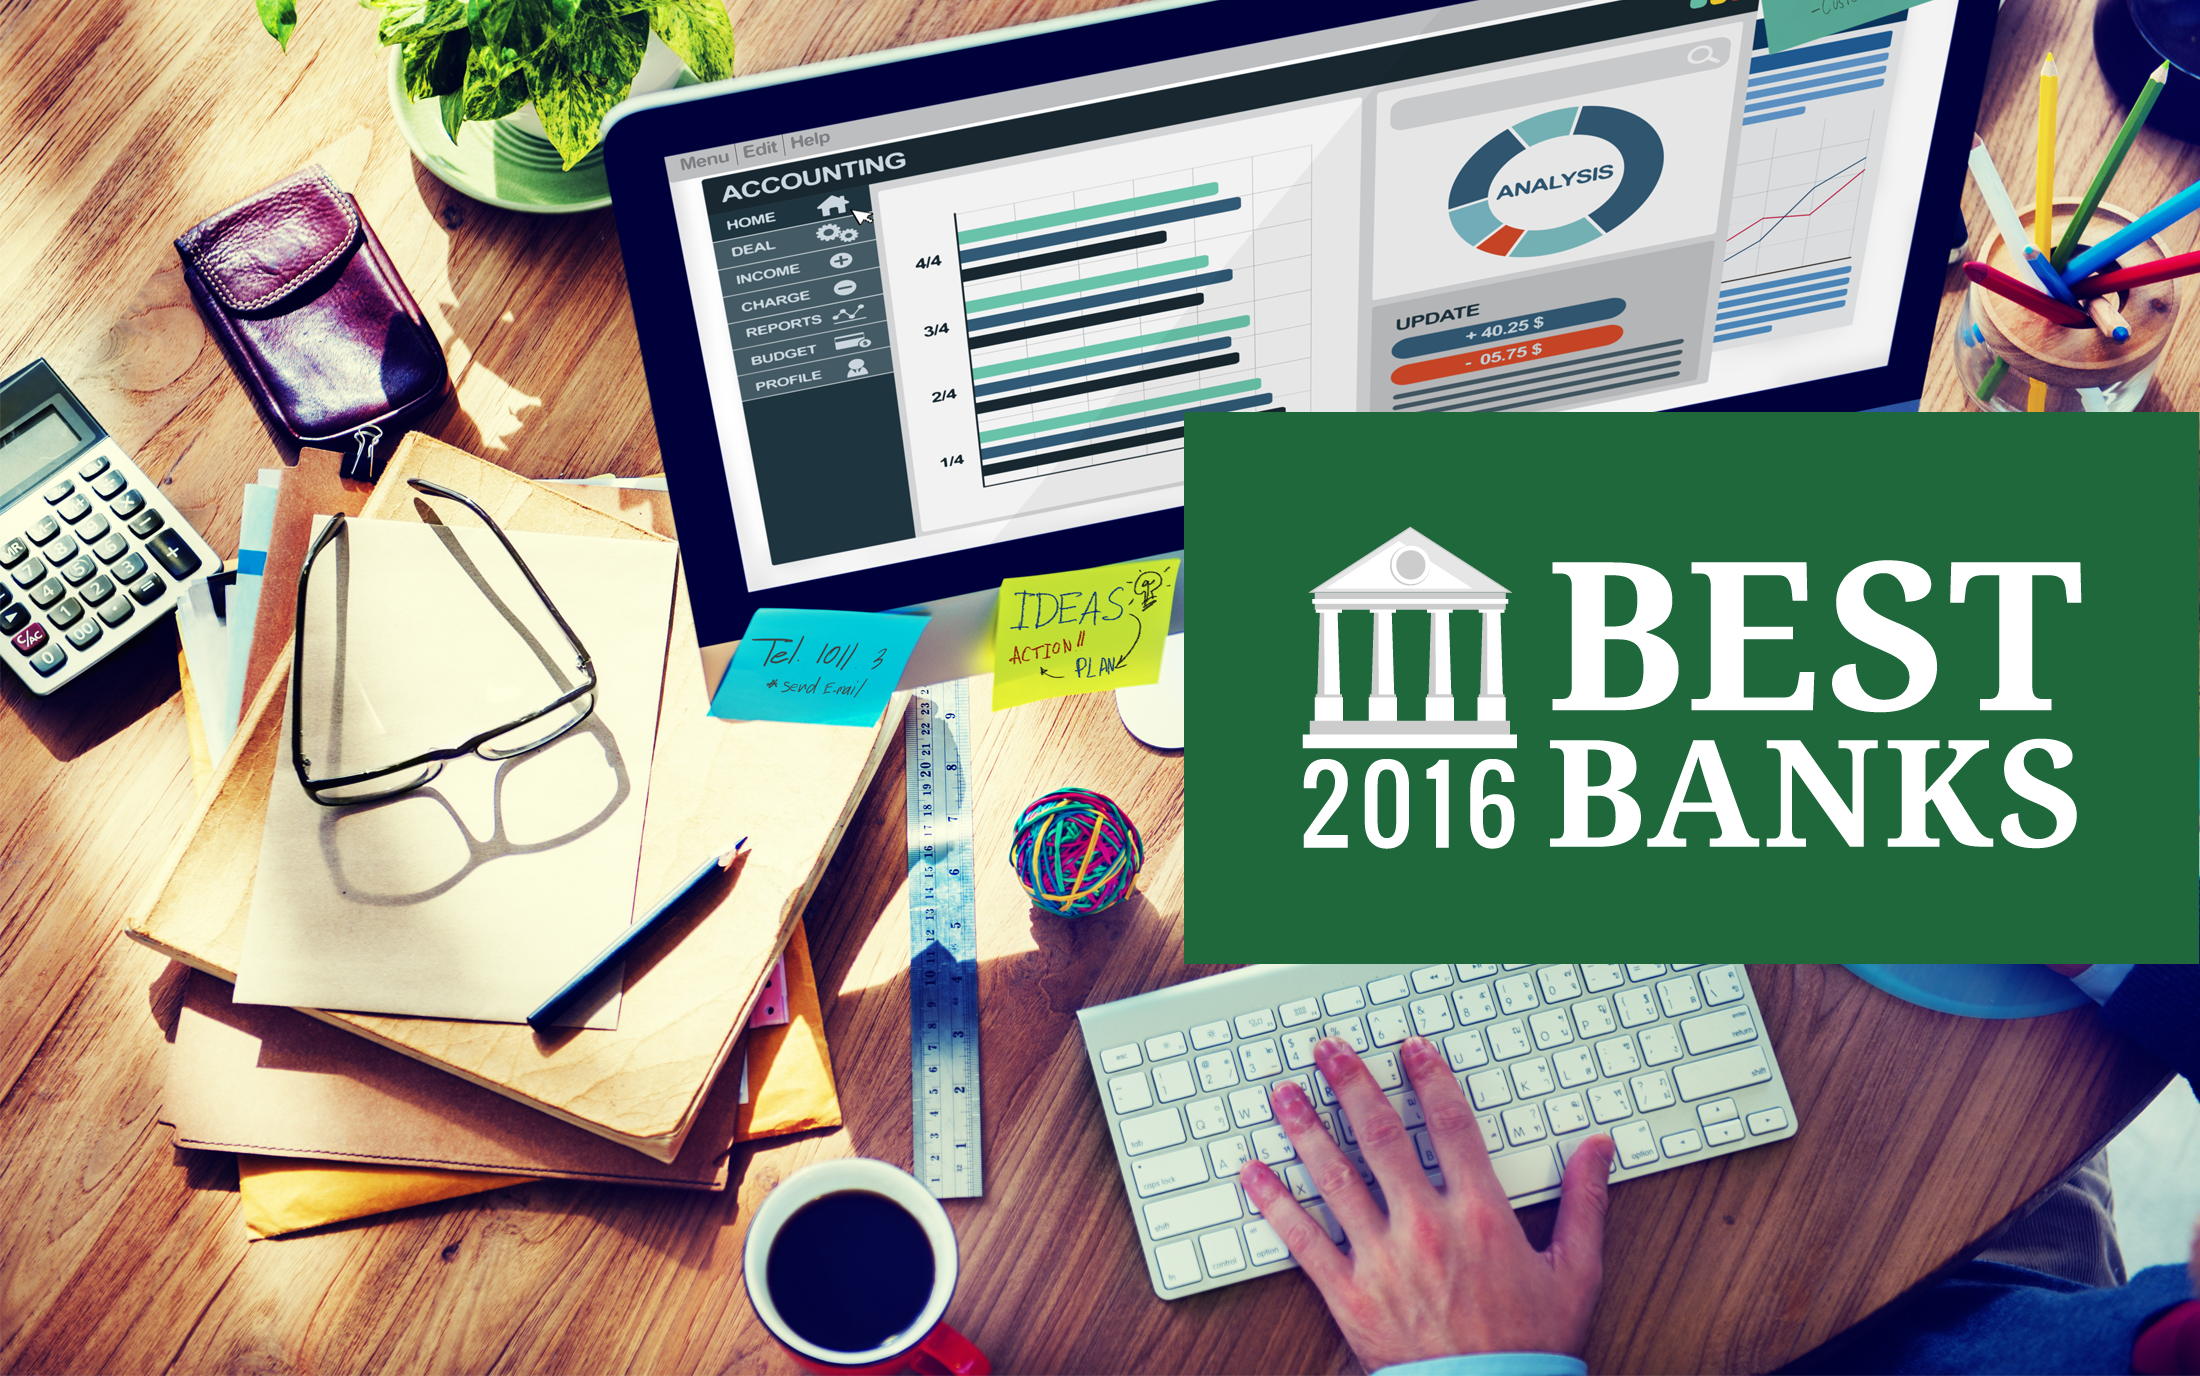 Online Banks Cd Rates Gbr Bestbanks Rankingarticles Online V